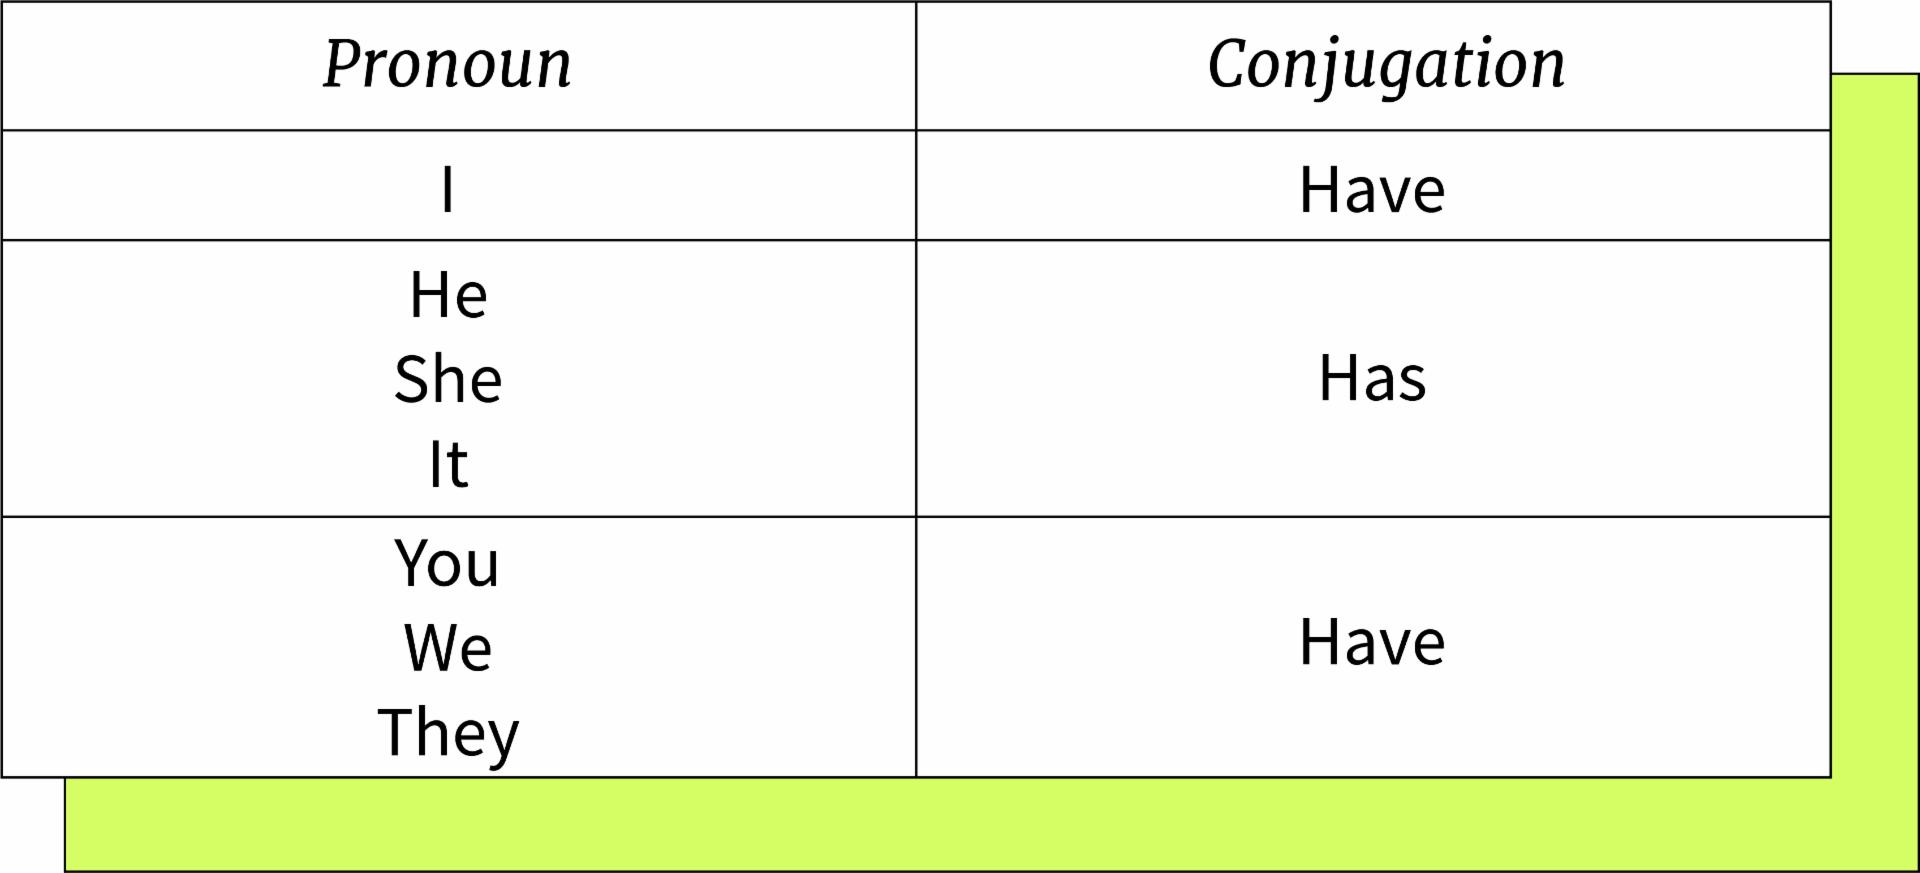 Modelo de como conjugar o verbo to have conforme o pronome: